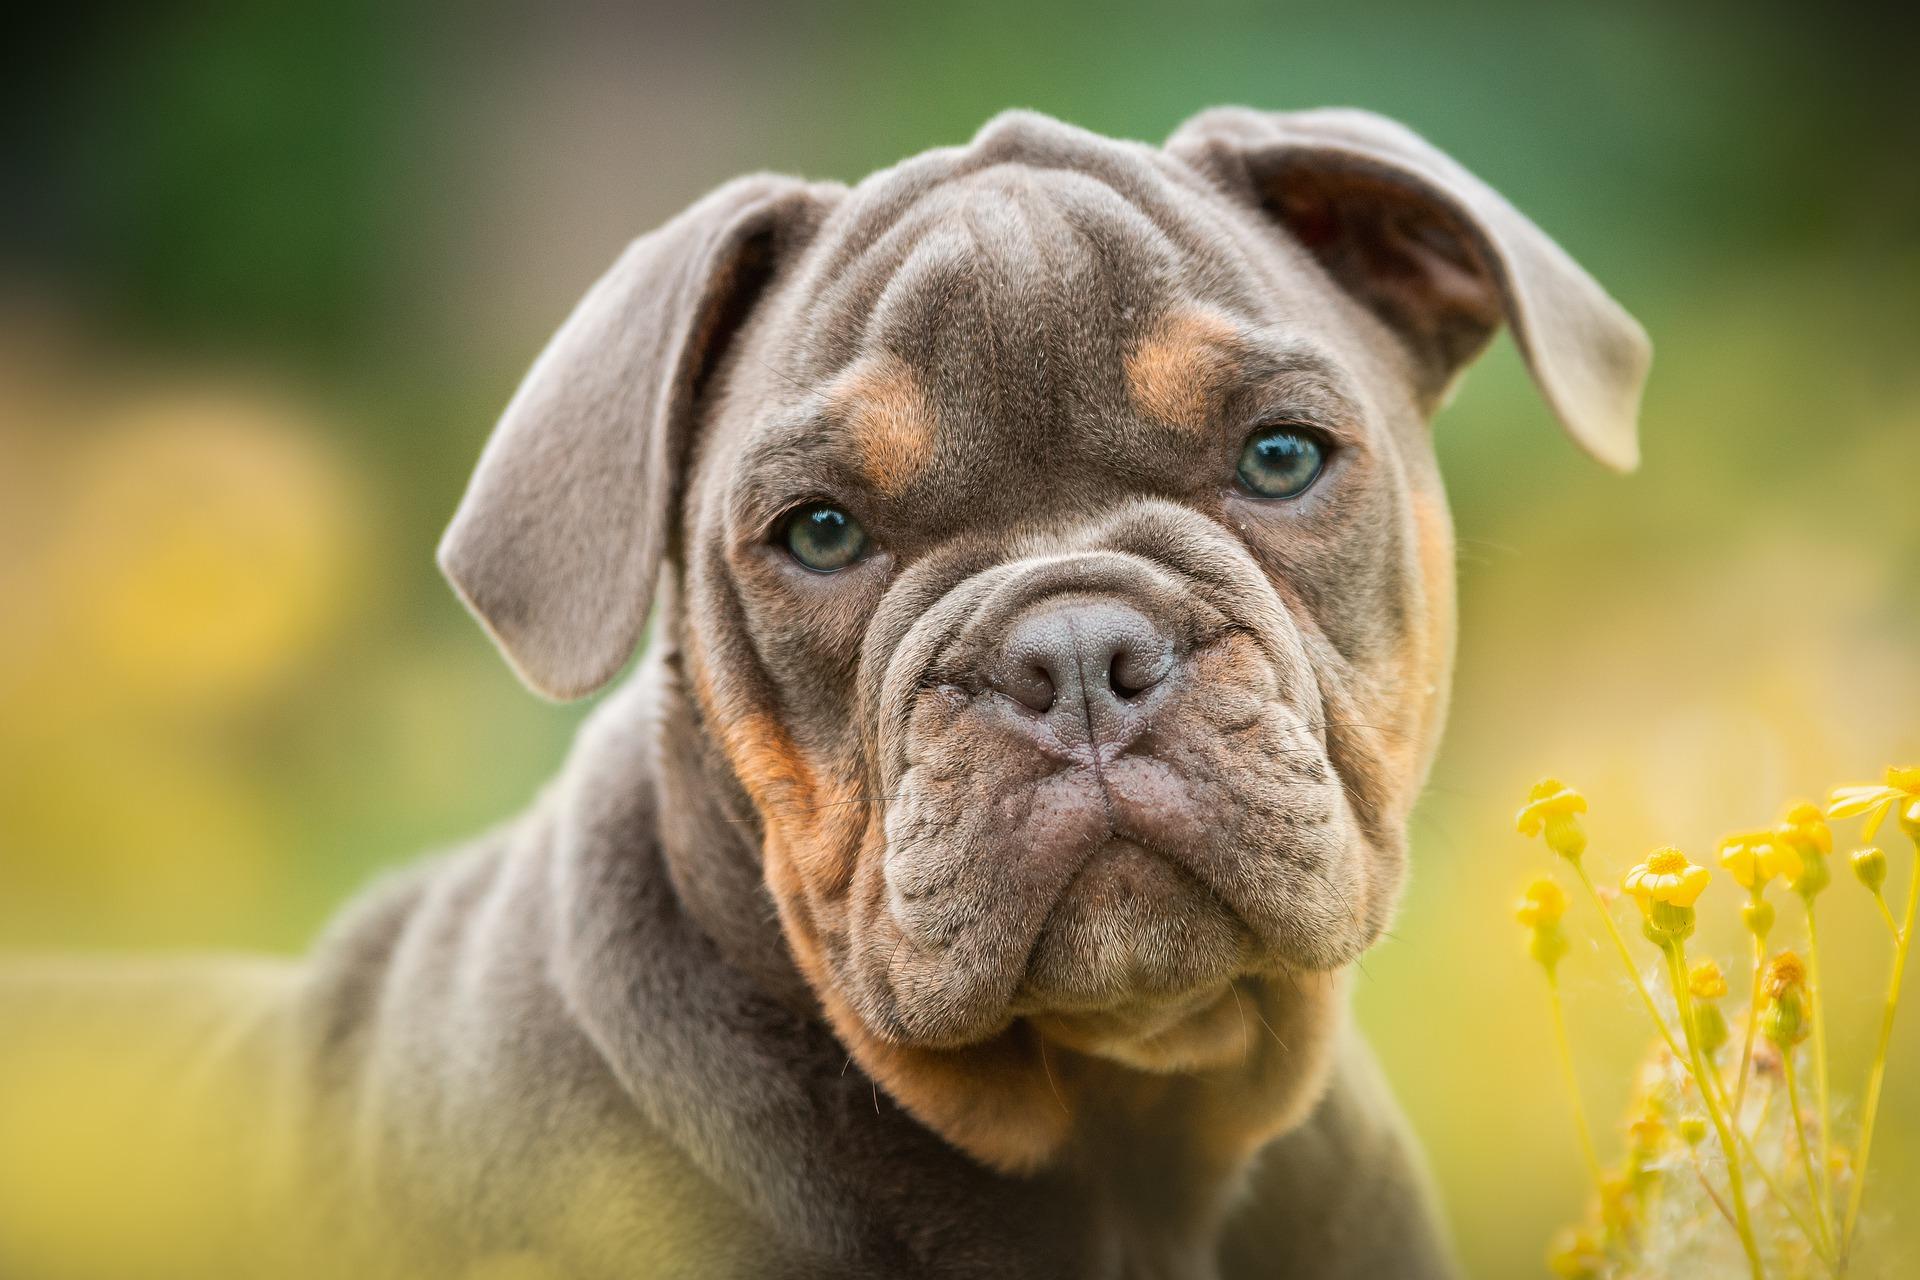 cane guarda favoritismi